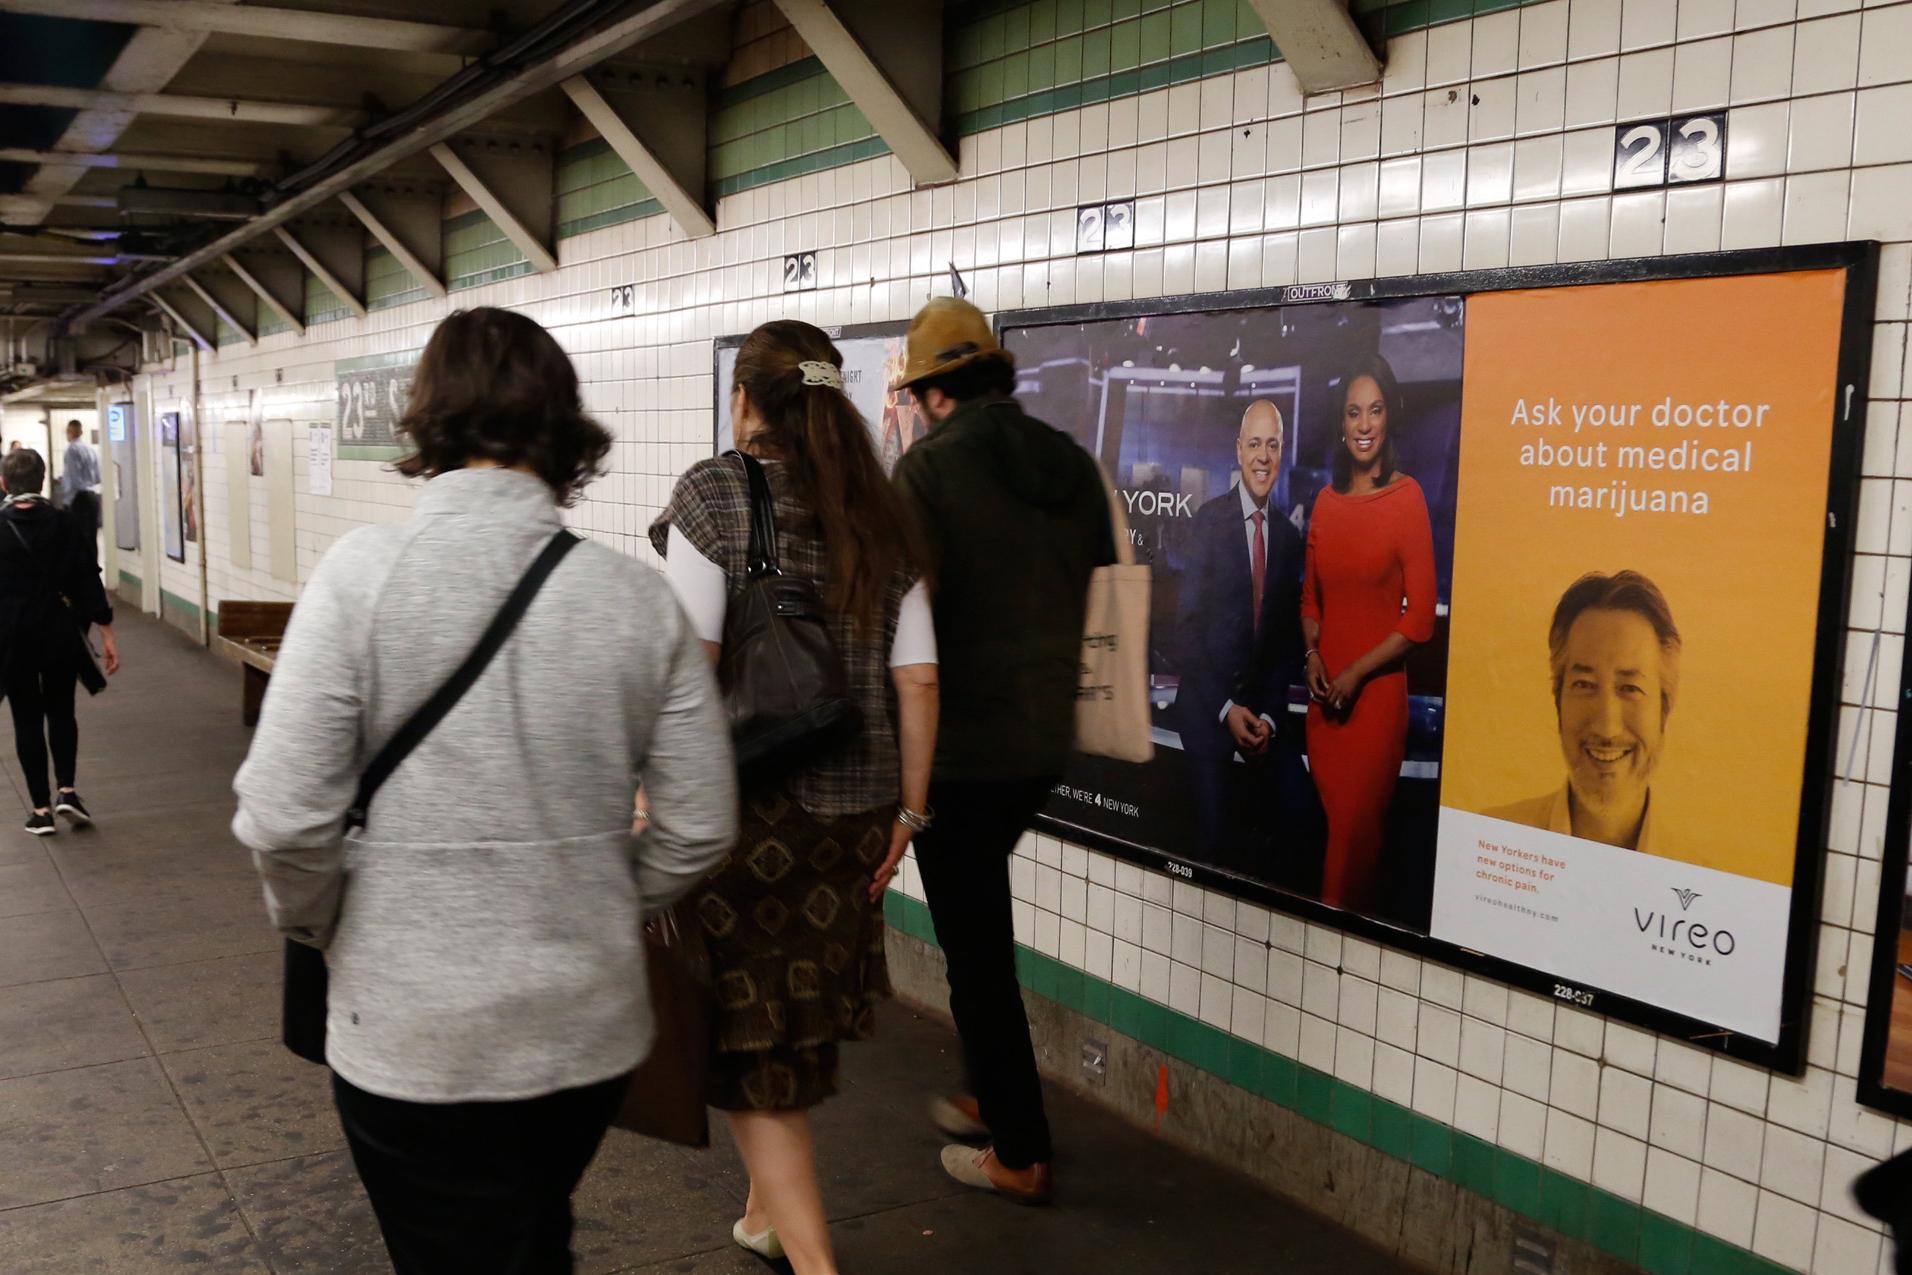 subwaypic